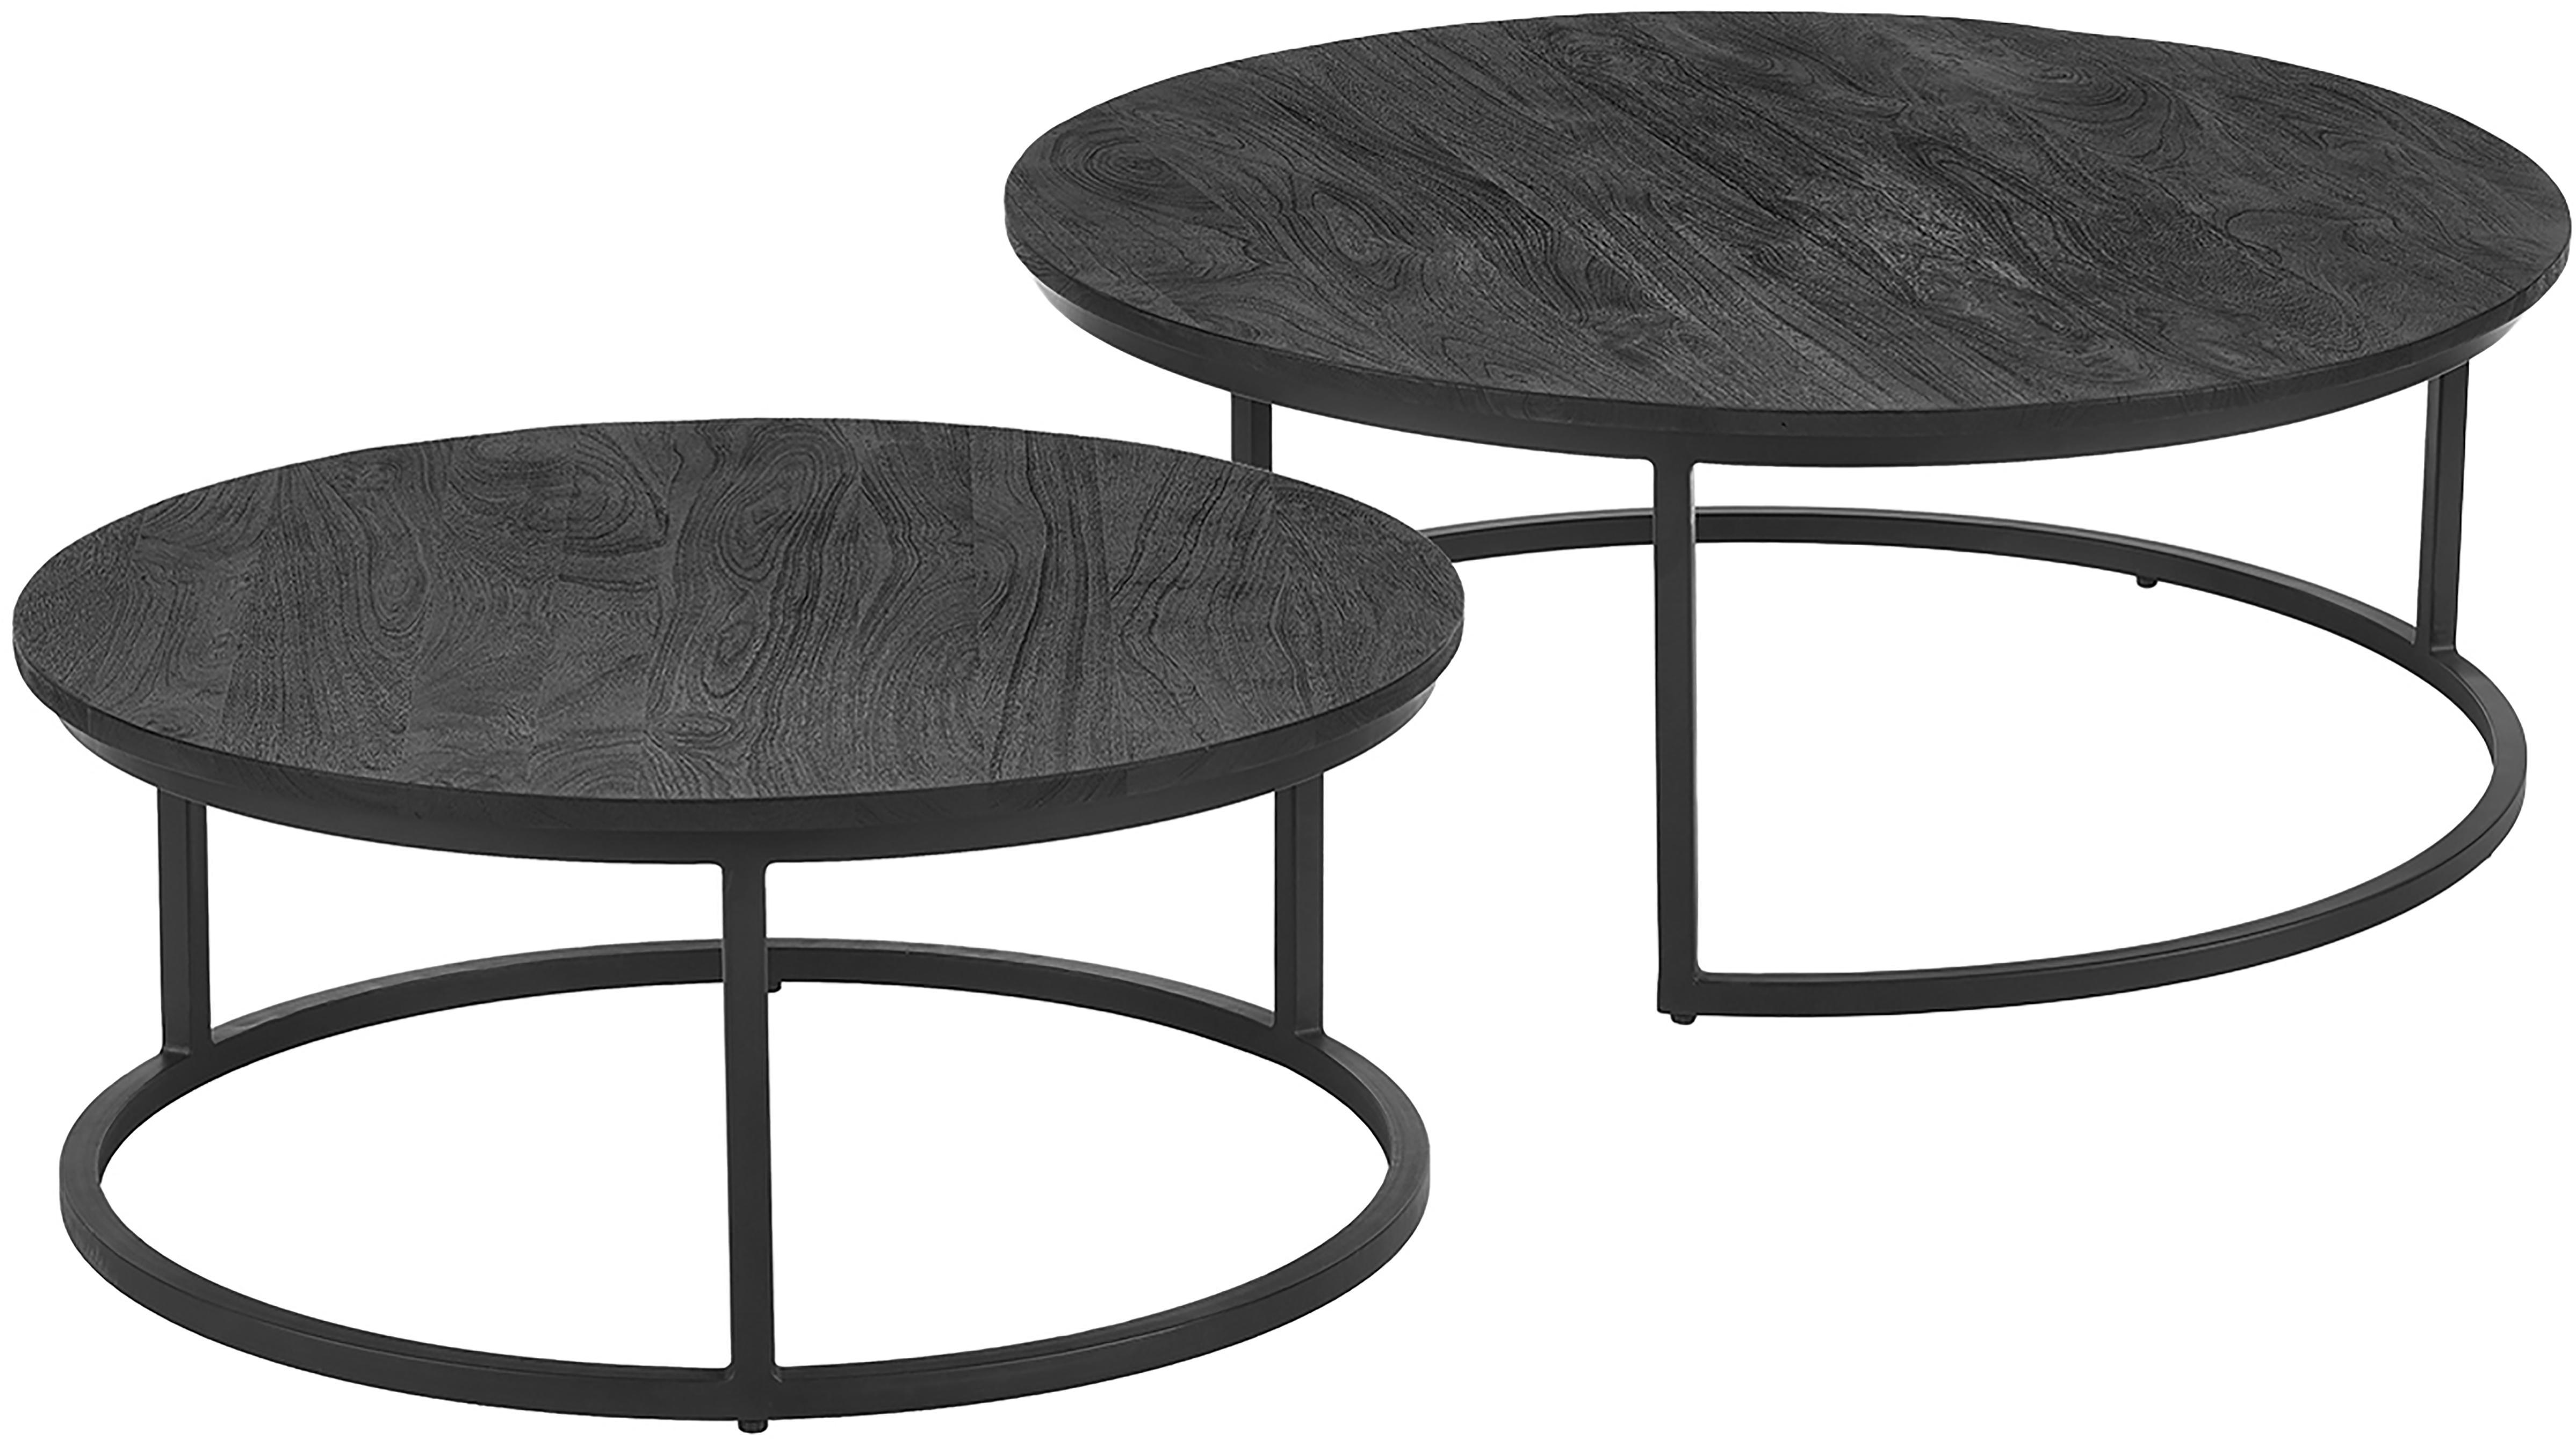 Salontafelset Andrew van zwarte mangohout, 2-delig, Frame: gepoedercoat metaal, Tafelbladen: zwart gelakt mangohout. Frames: mat zwart, Verschillende formaten